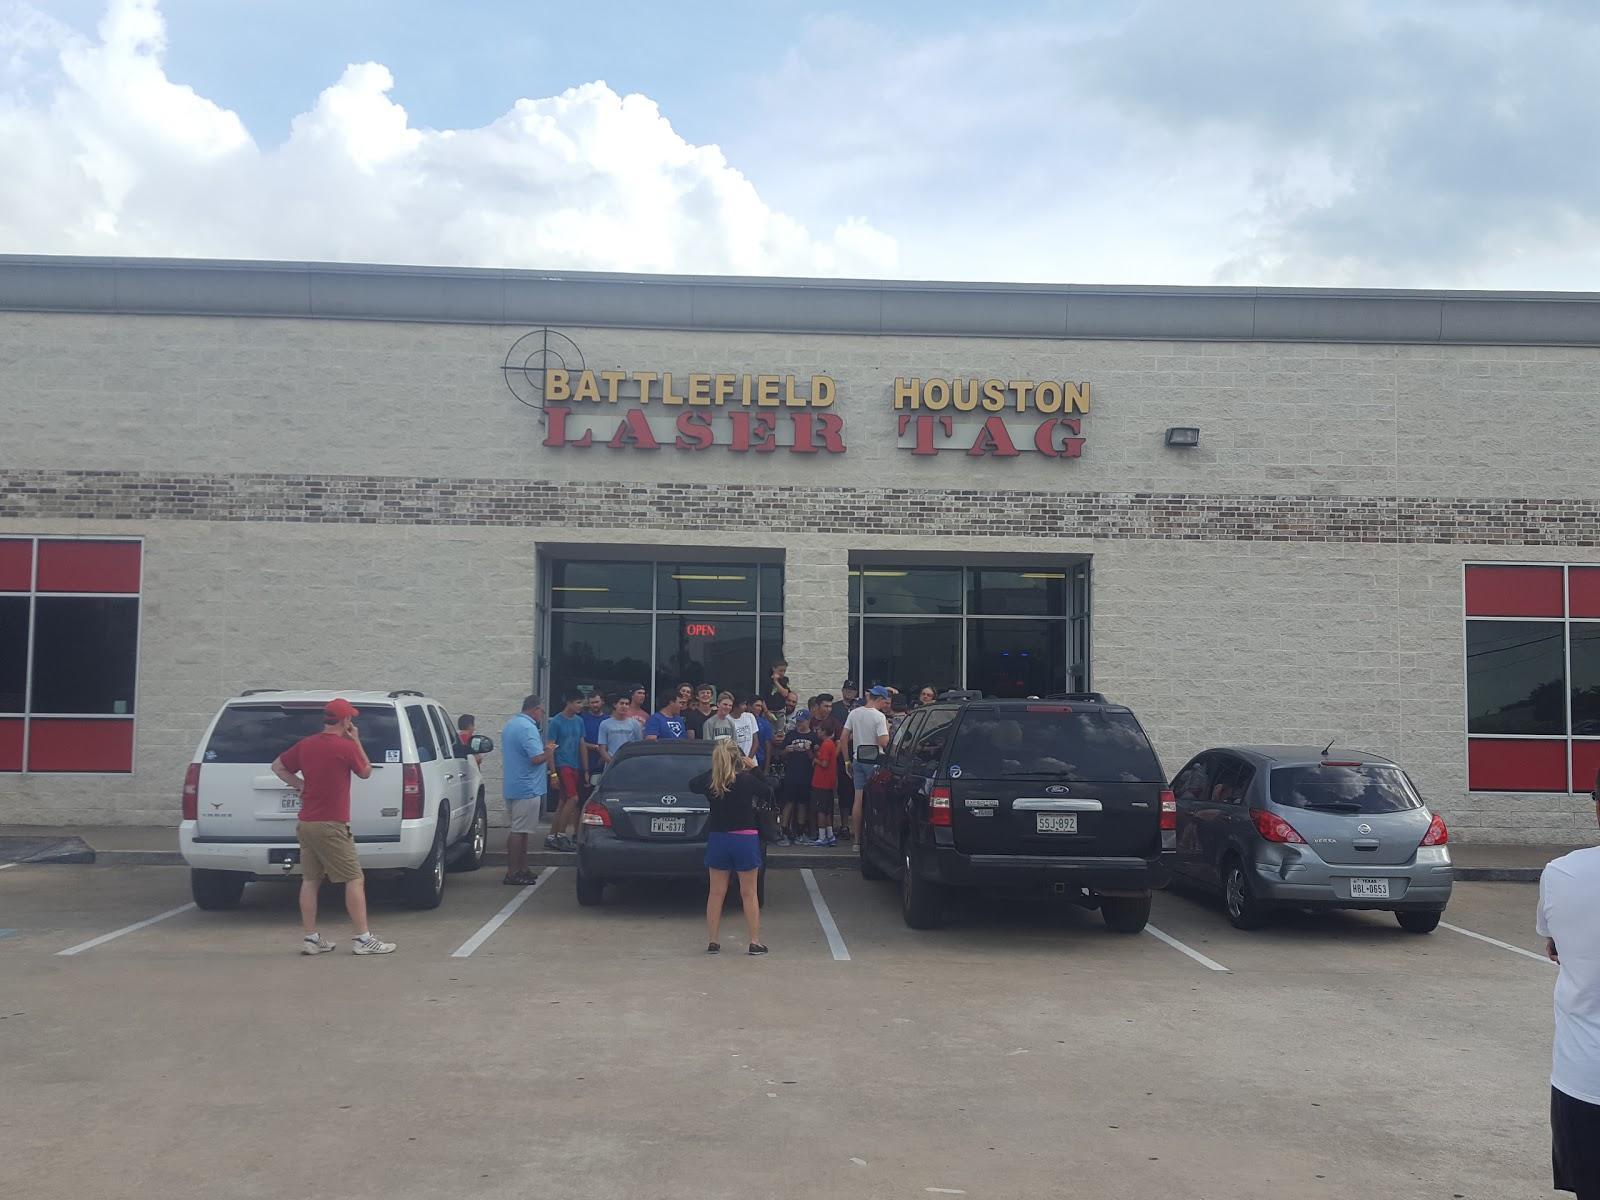 Magiske Fødselsdage Hos Battlefield Houston